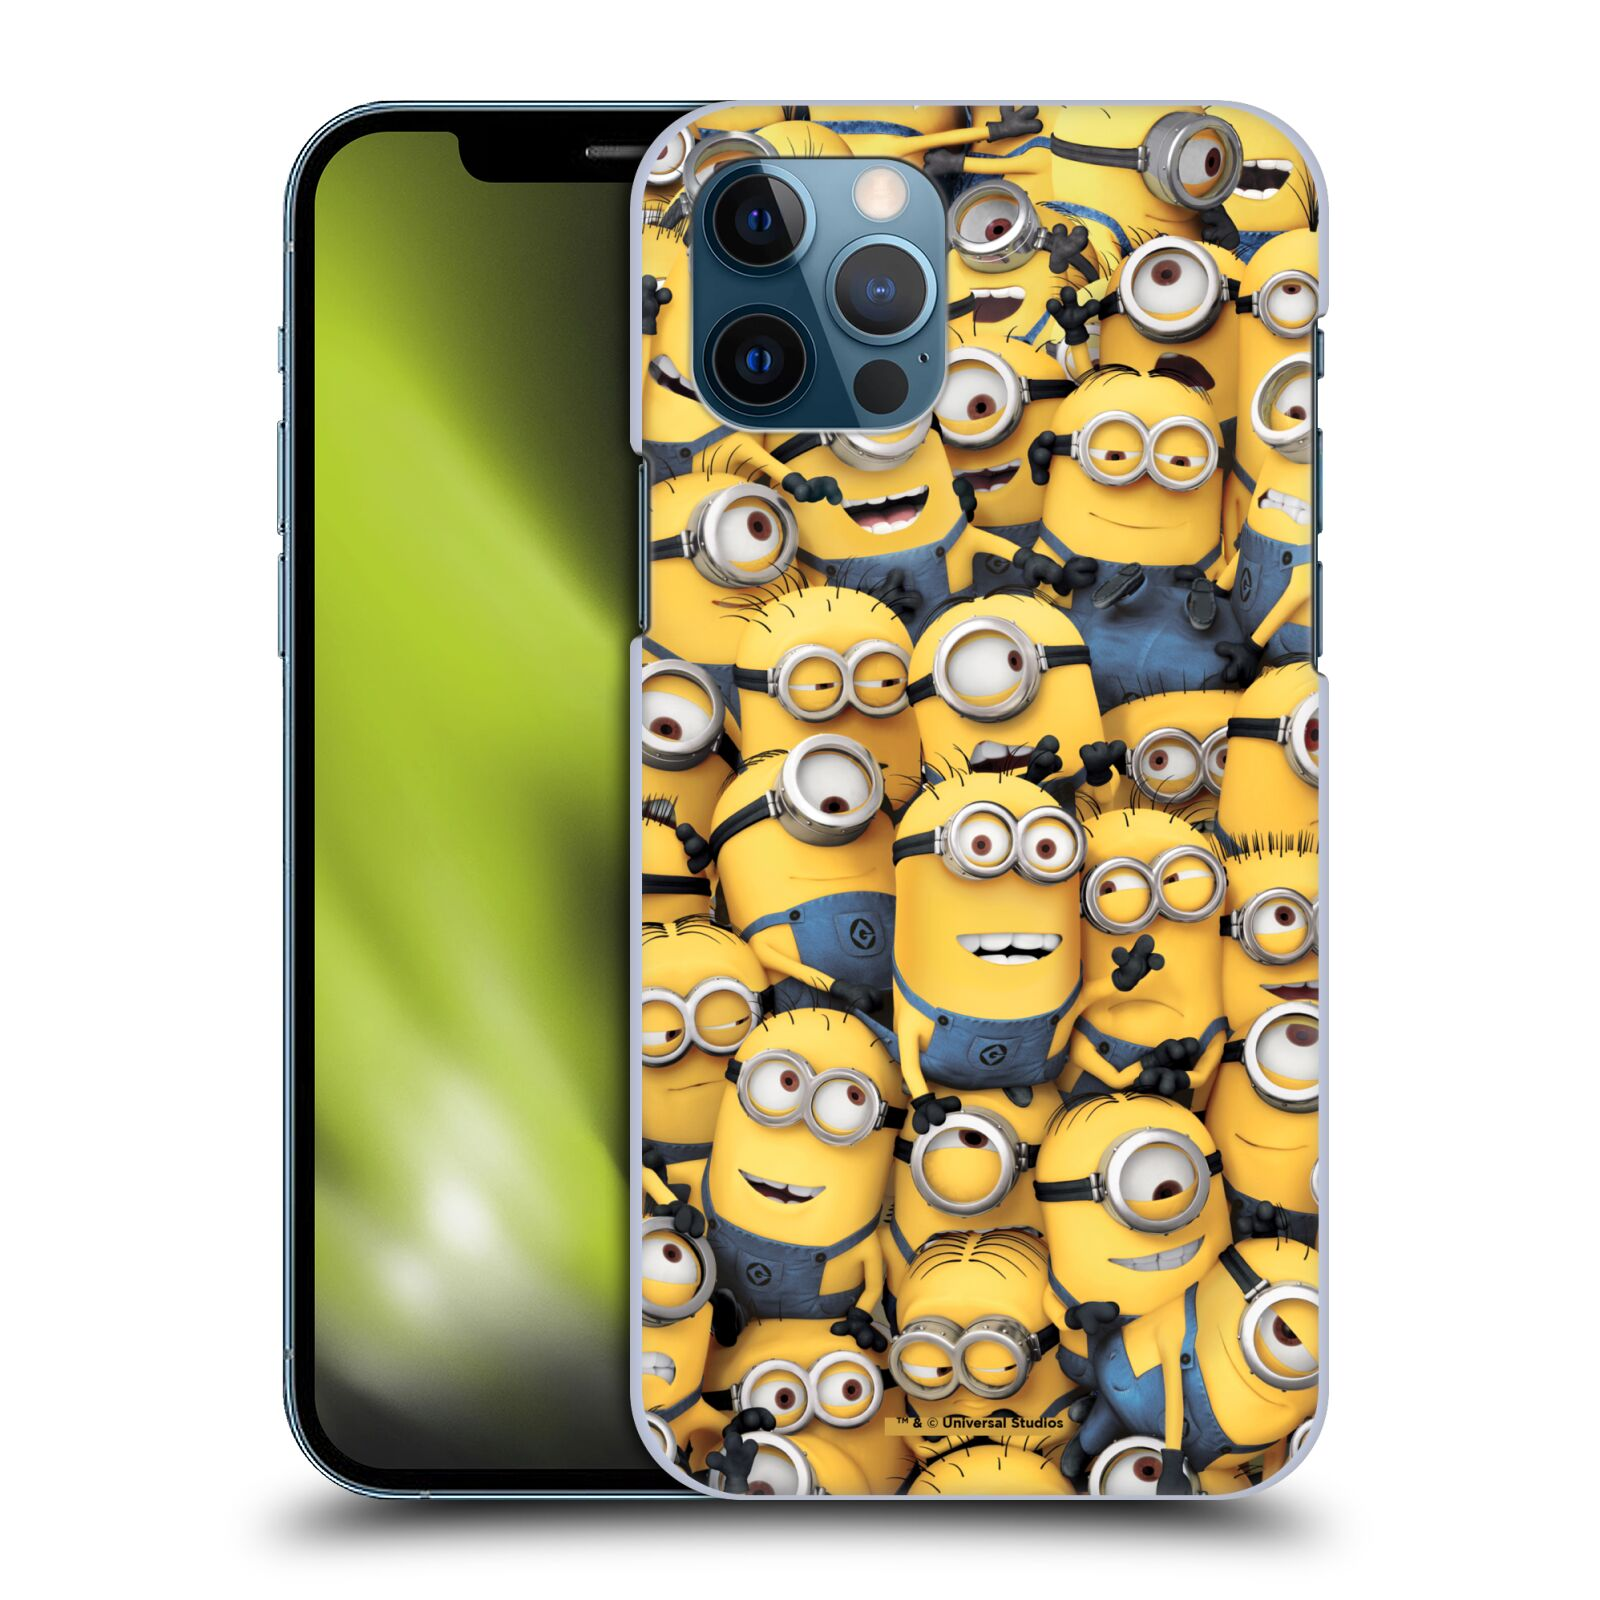 Plastové pouzdro na mobil Apple iPhone 12 / 12 Pro - Head Case - Mimoni všude z filmu Já, padouch - Despicable Me